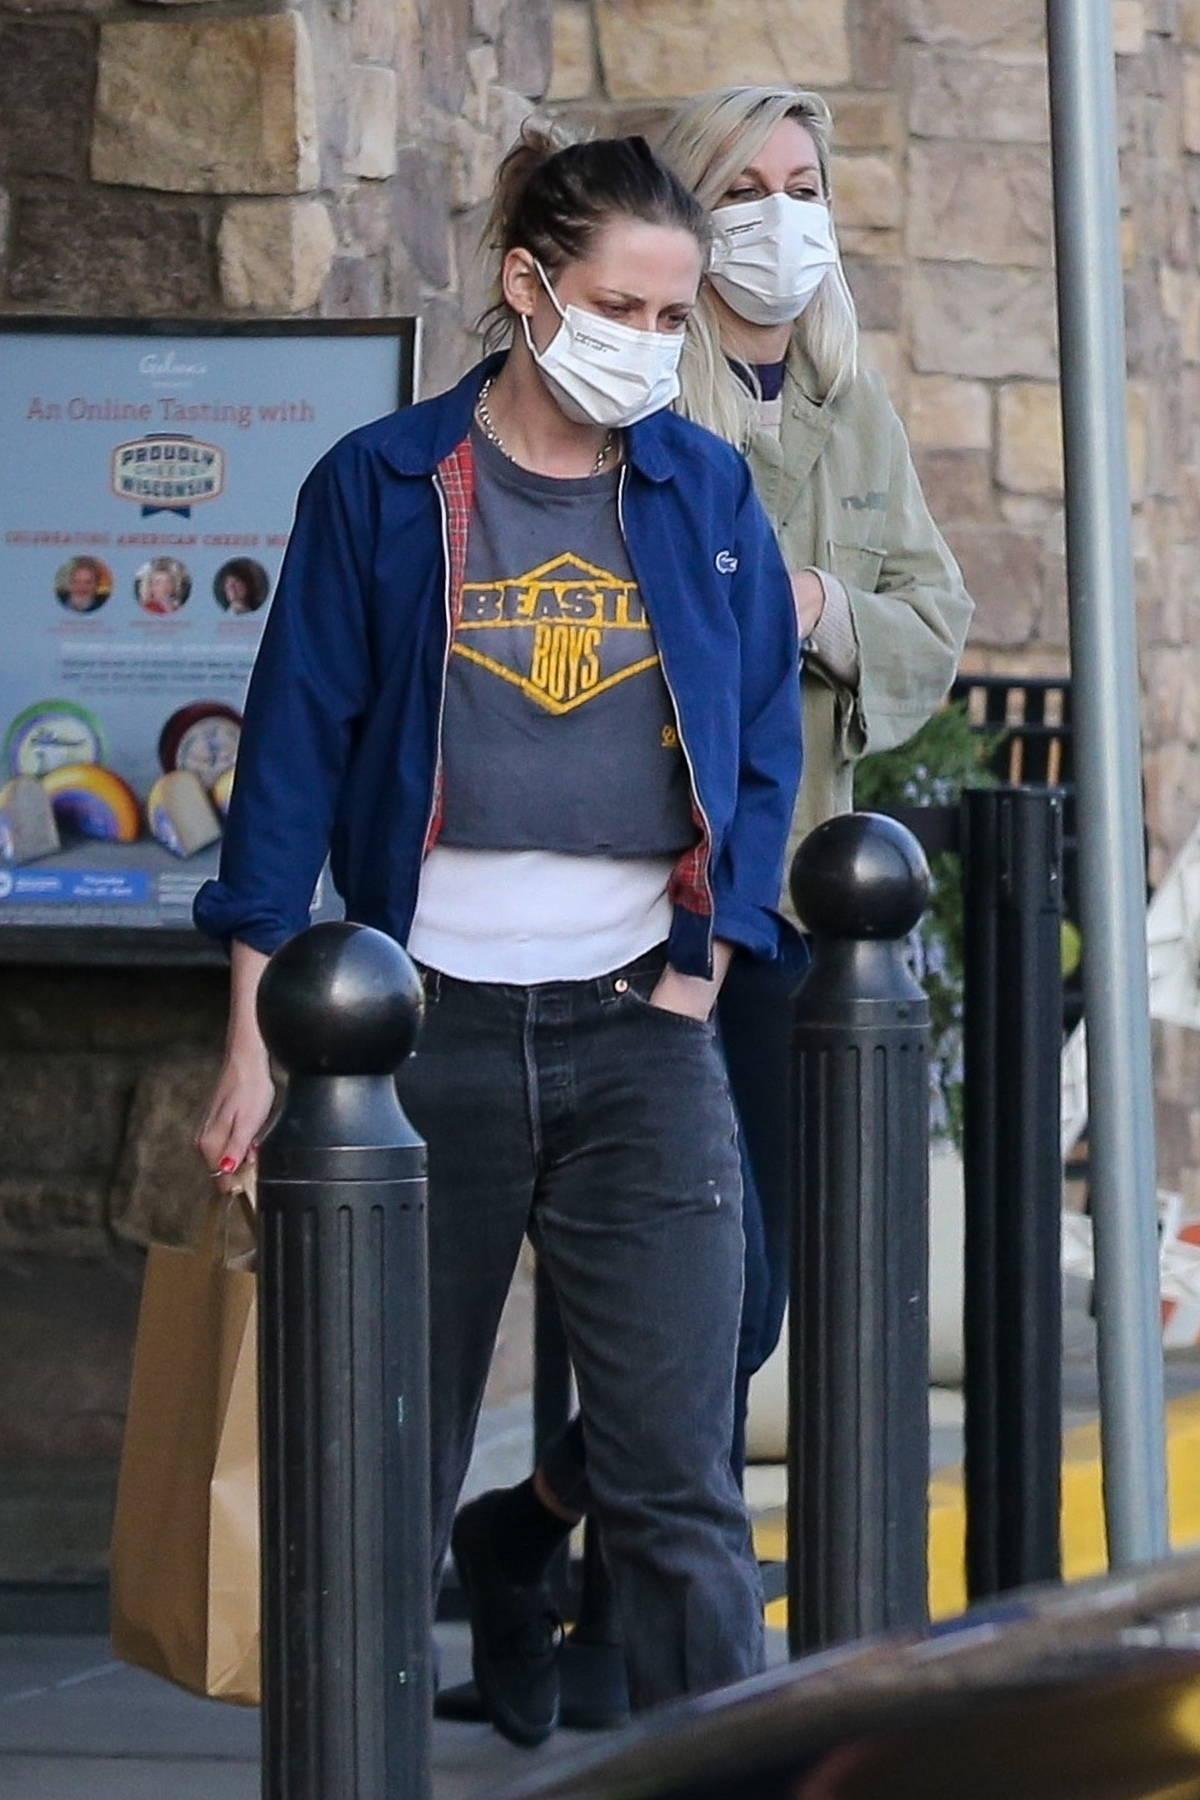 Kristen Stewart rocks a 'Beastie Boys' tee for a trip to the grocery store with girlfriend Dylan Meyer in Los Feliz, California